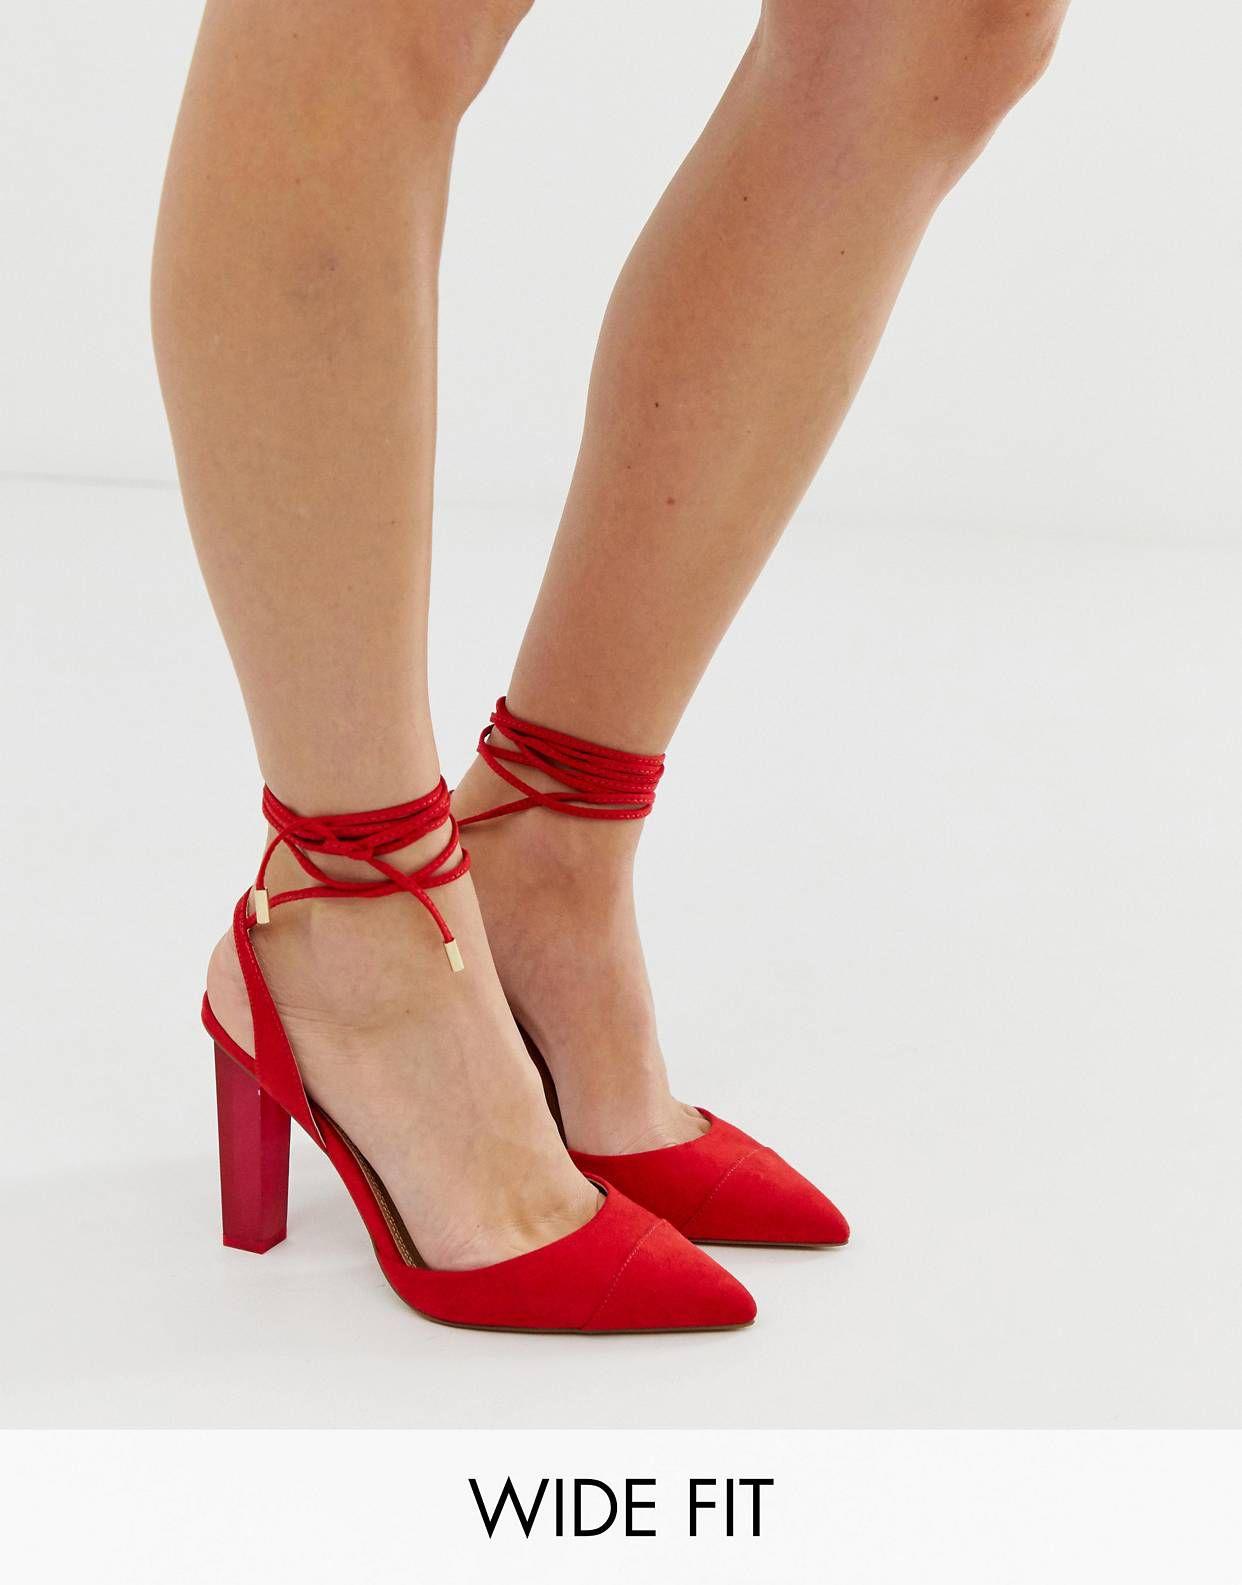 d3963756b99f DESIGN Wide Fit Pucker Up tie leg pointed high heels in 2019 ...